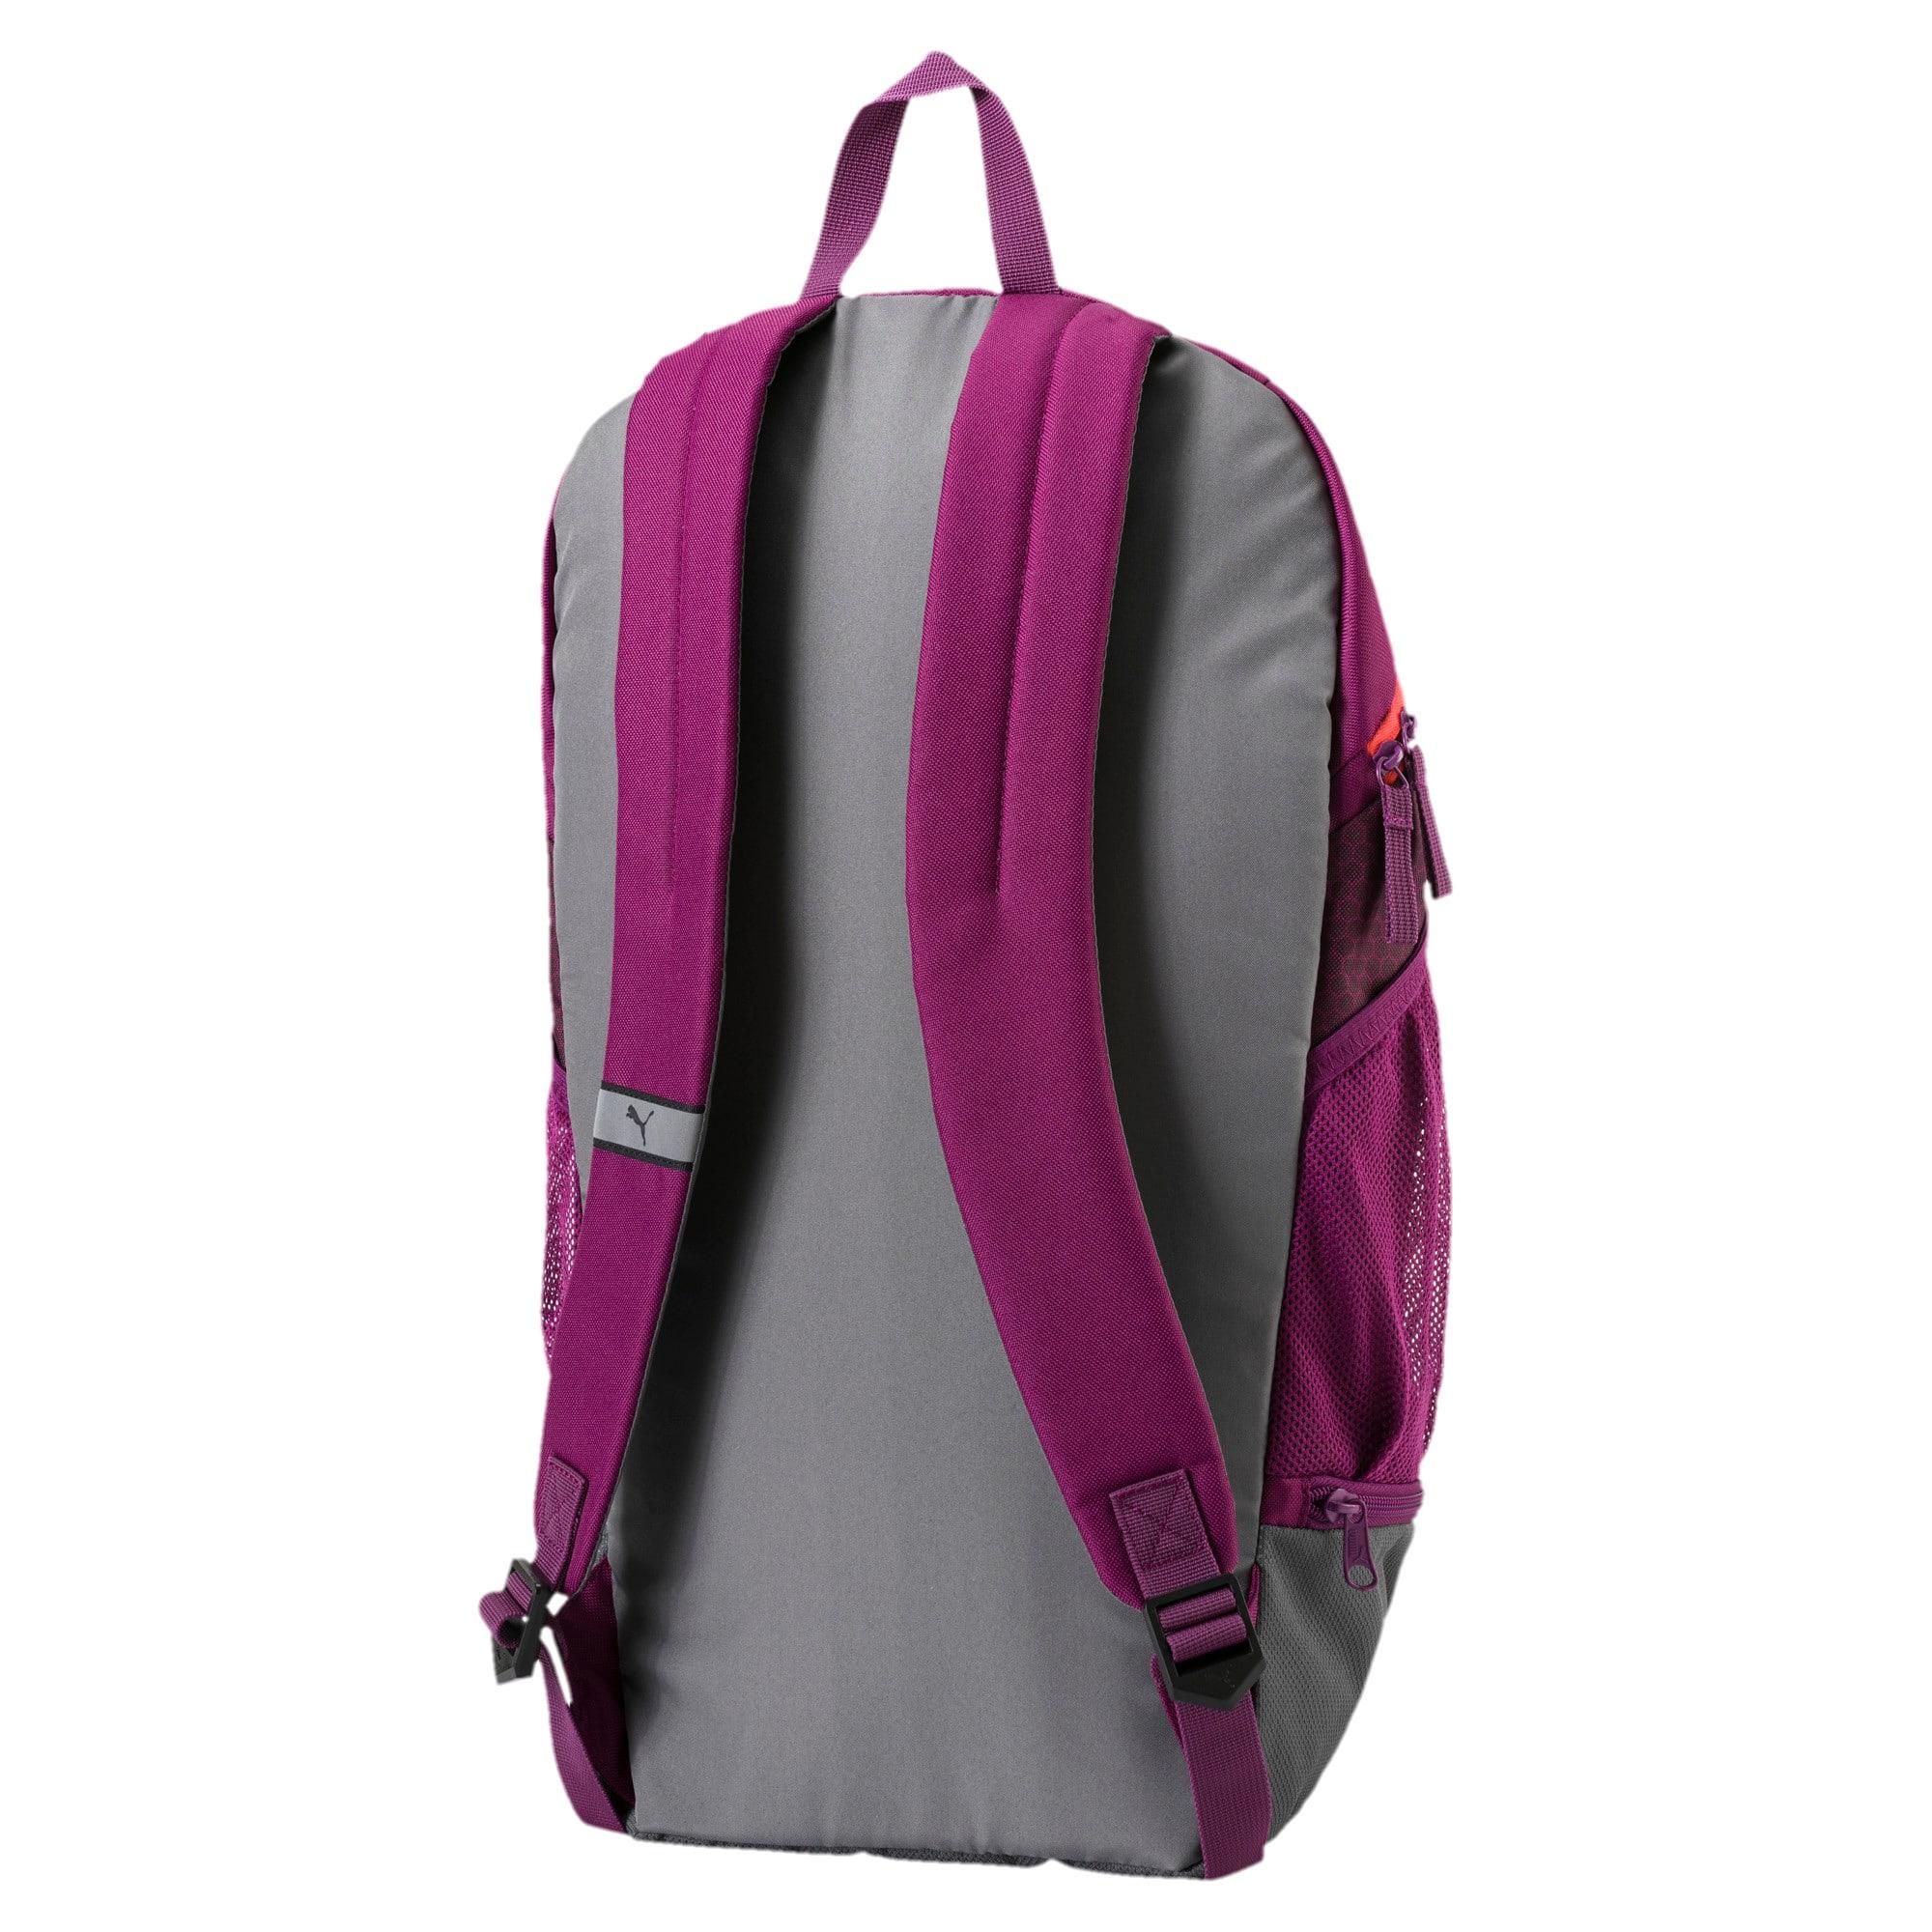 Thumbnail 2 of Echo Backpack, Dark Purple-Hot Coral, medium-IND